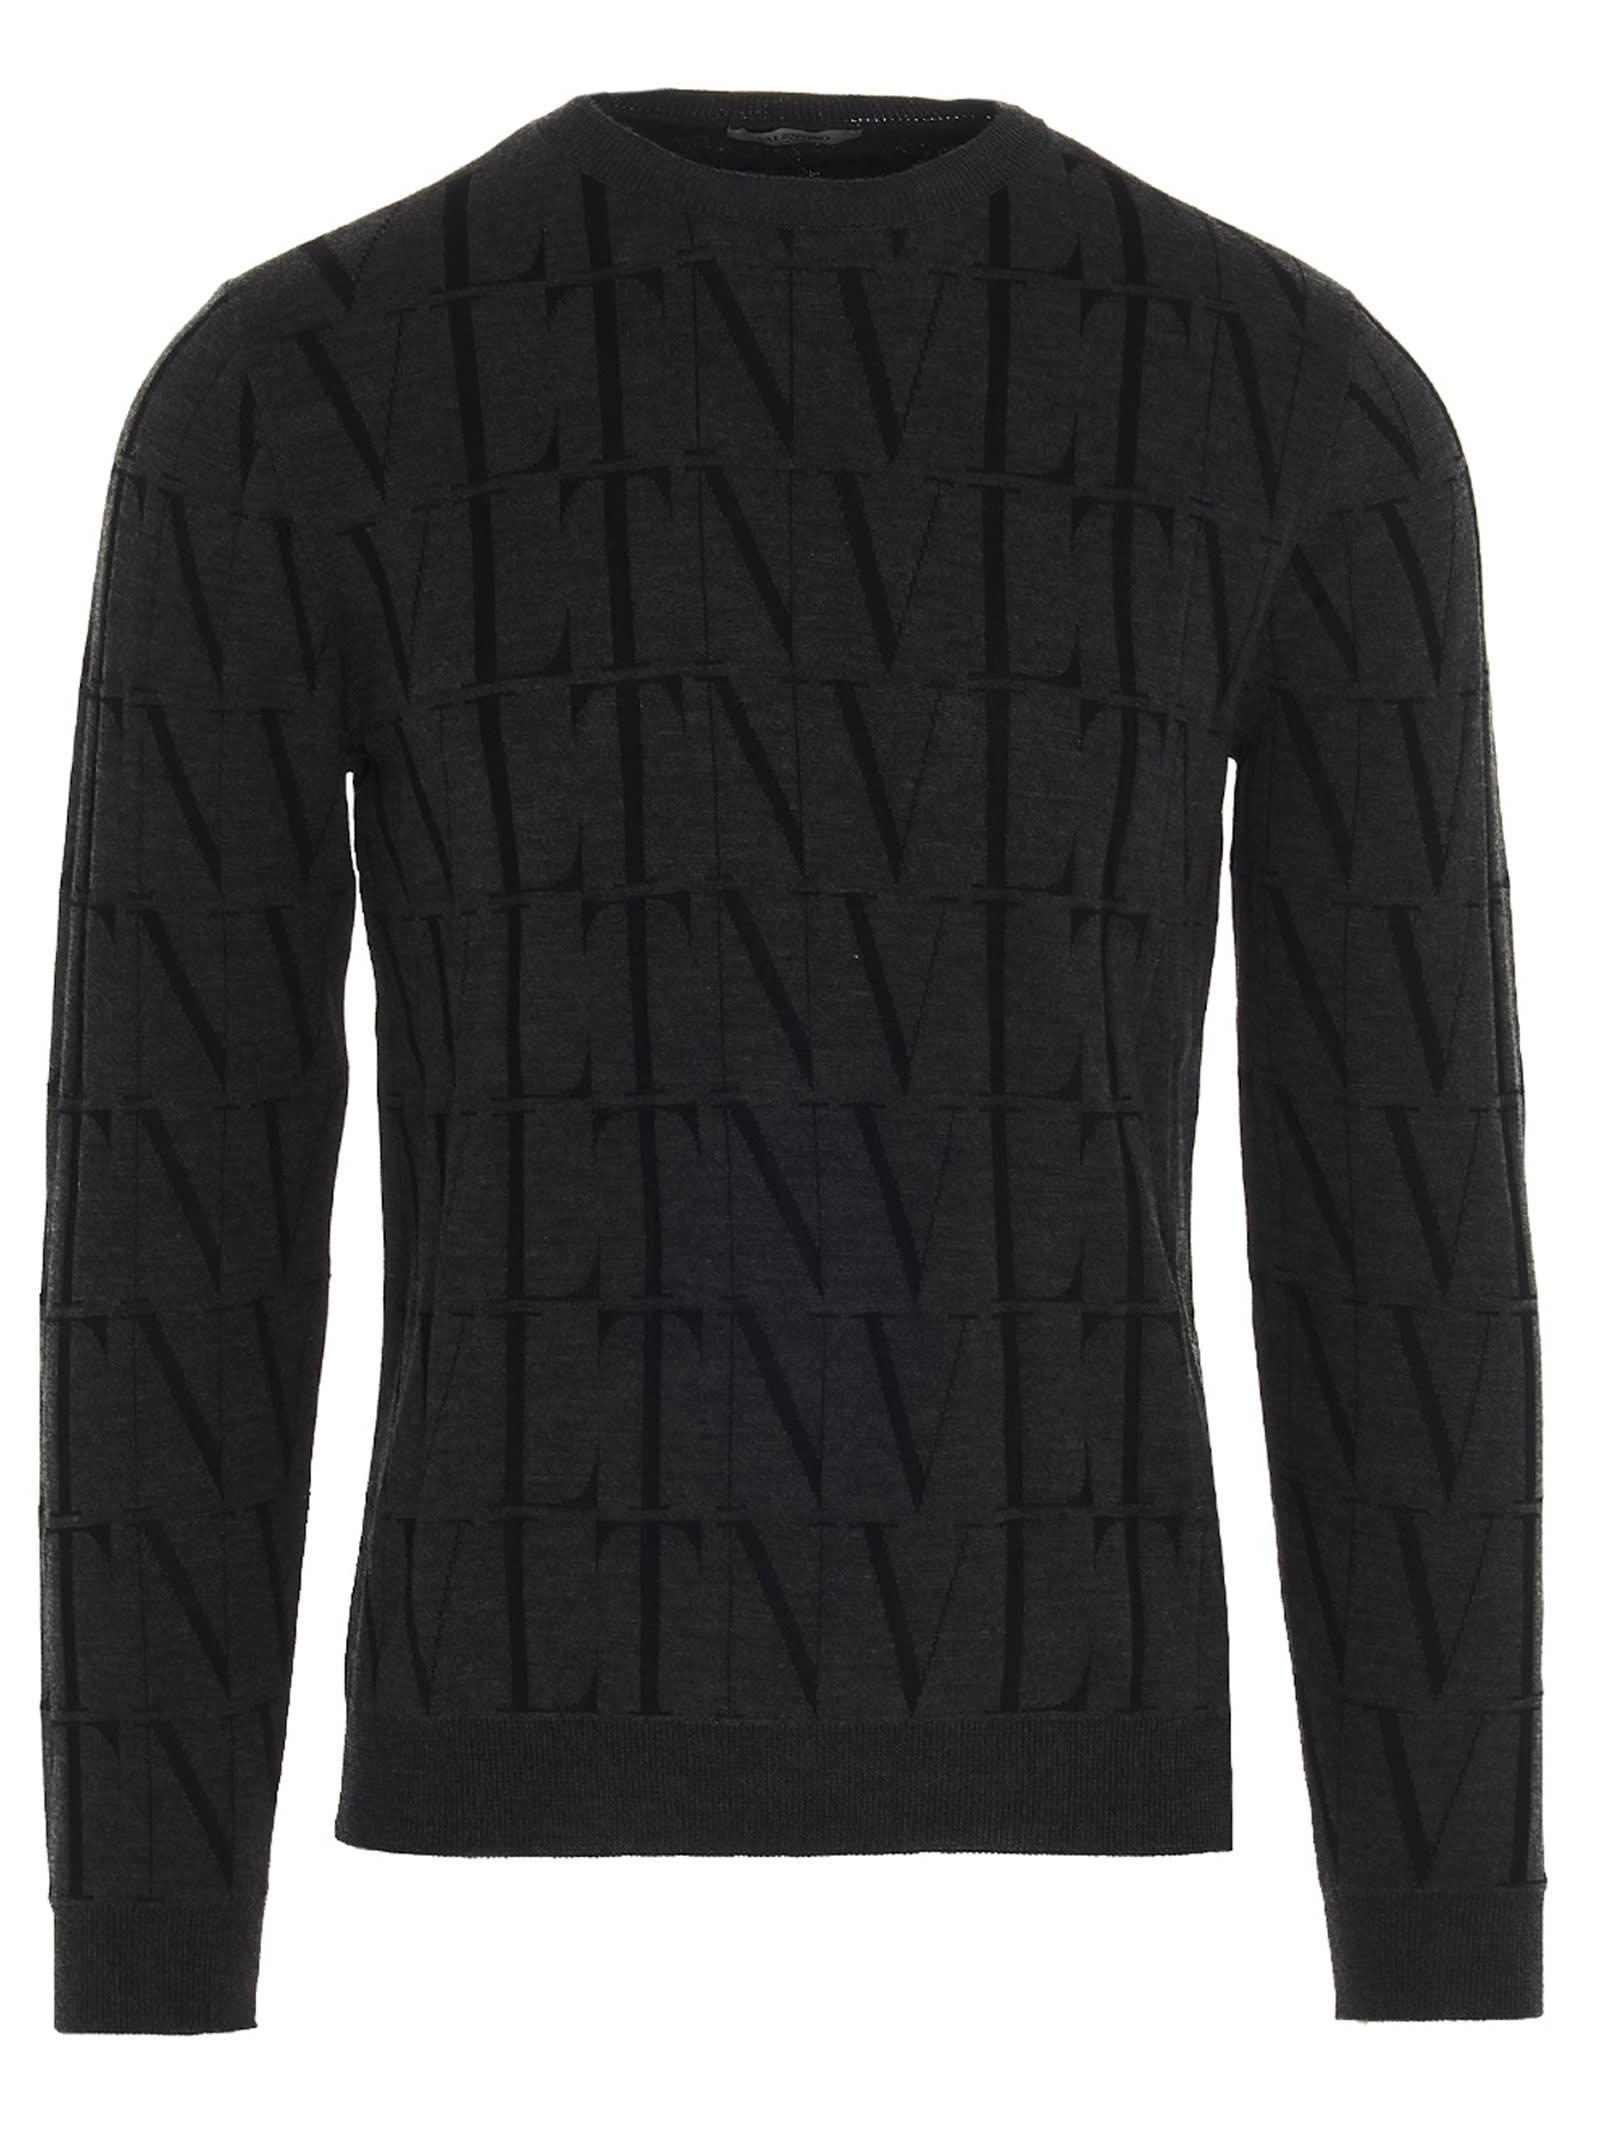 Valentino vltn Times Sweater